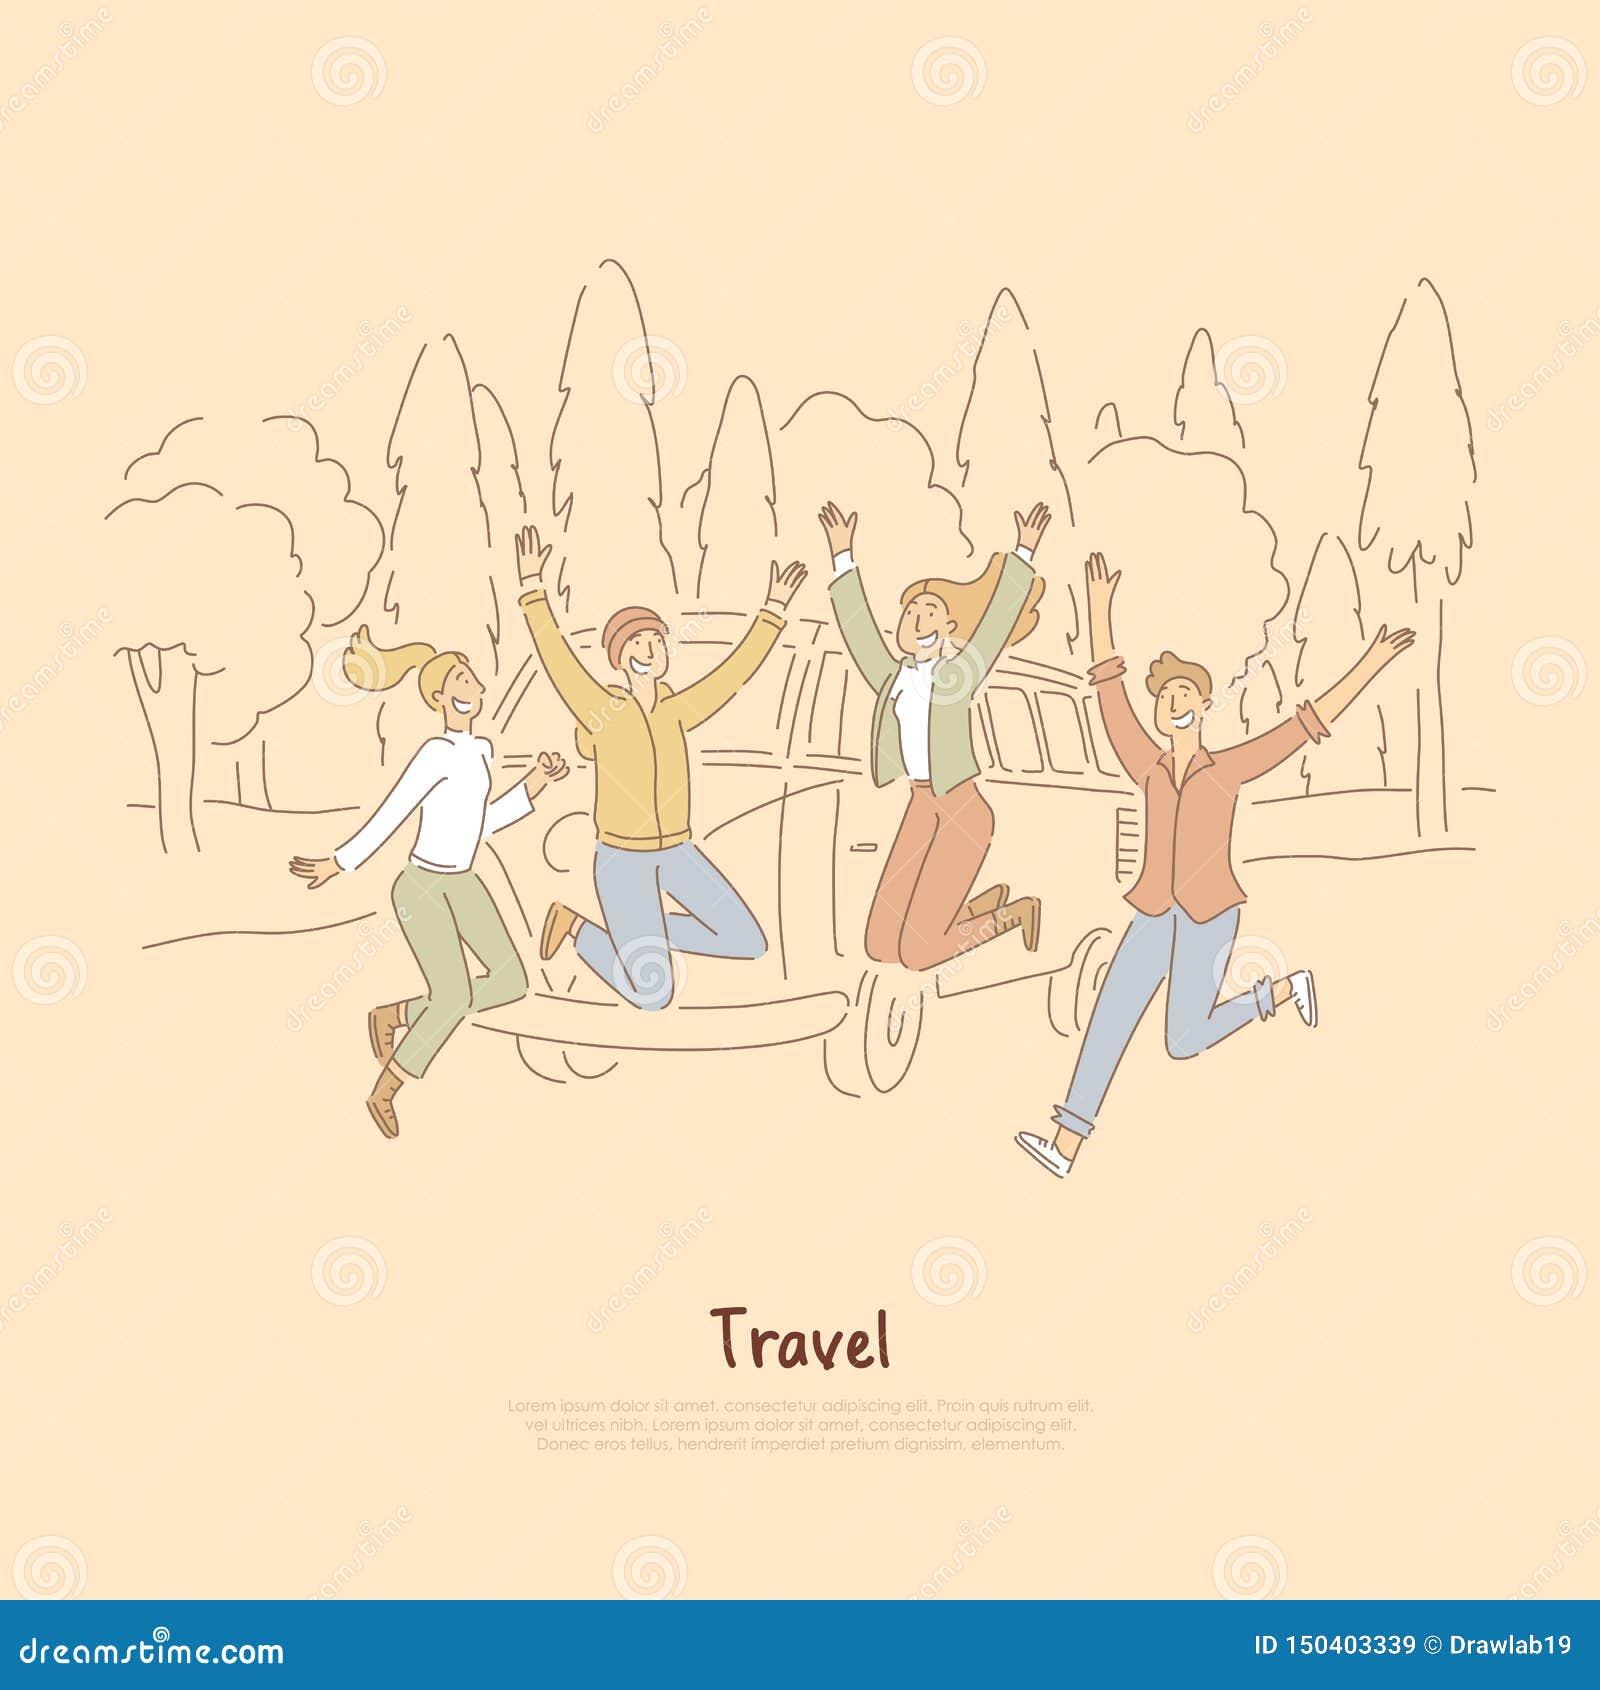 Road Trip Friends Stock Illustrations 449 Road Trip Friends Stock Illustrations Vectors Clipart Dreamstime